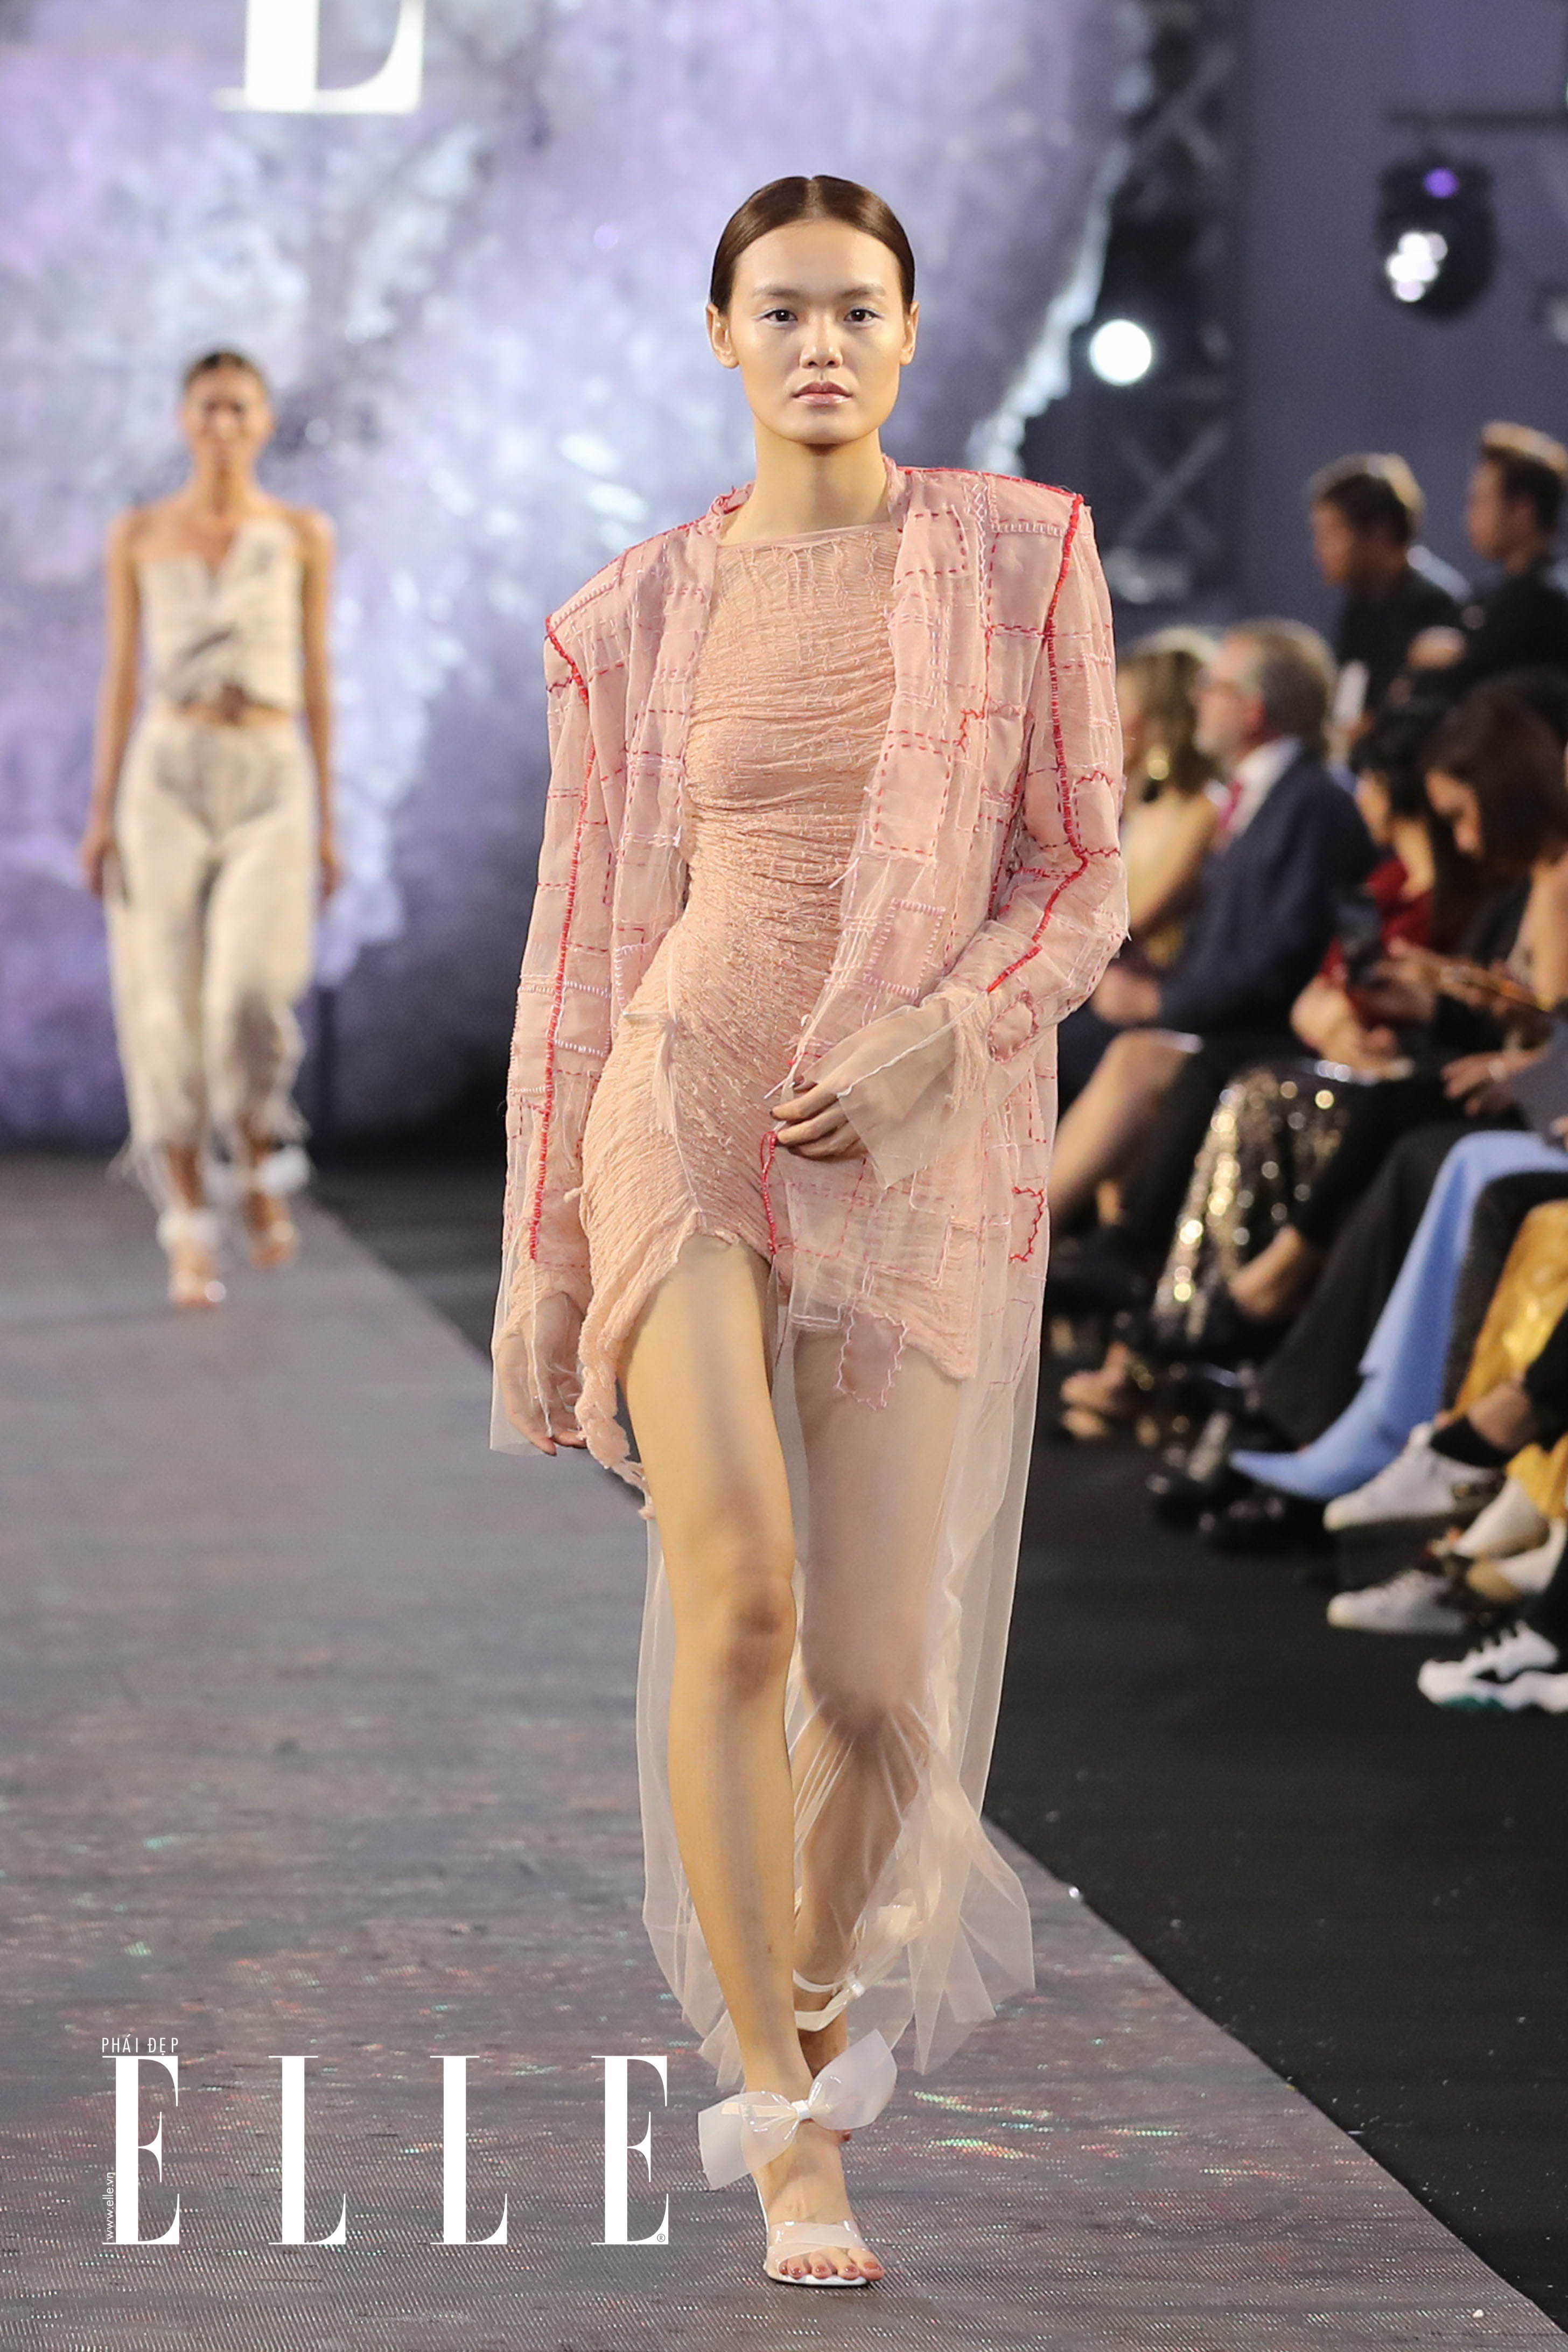 xu huong trang tu nhien diem thong linh san dien elle fashion journey 2018 17